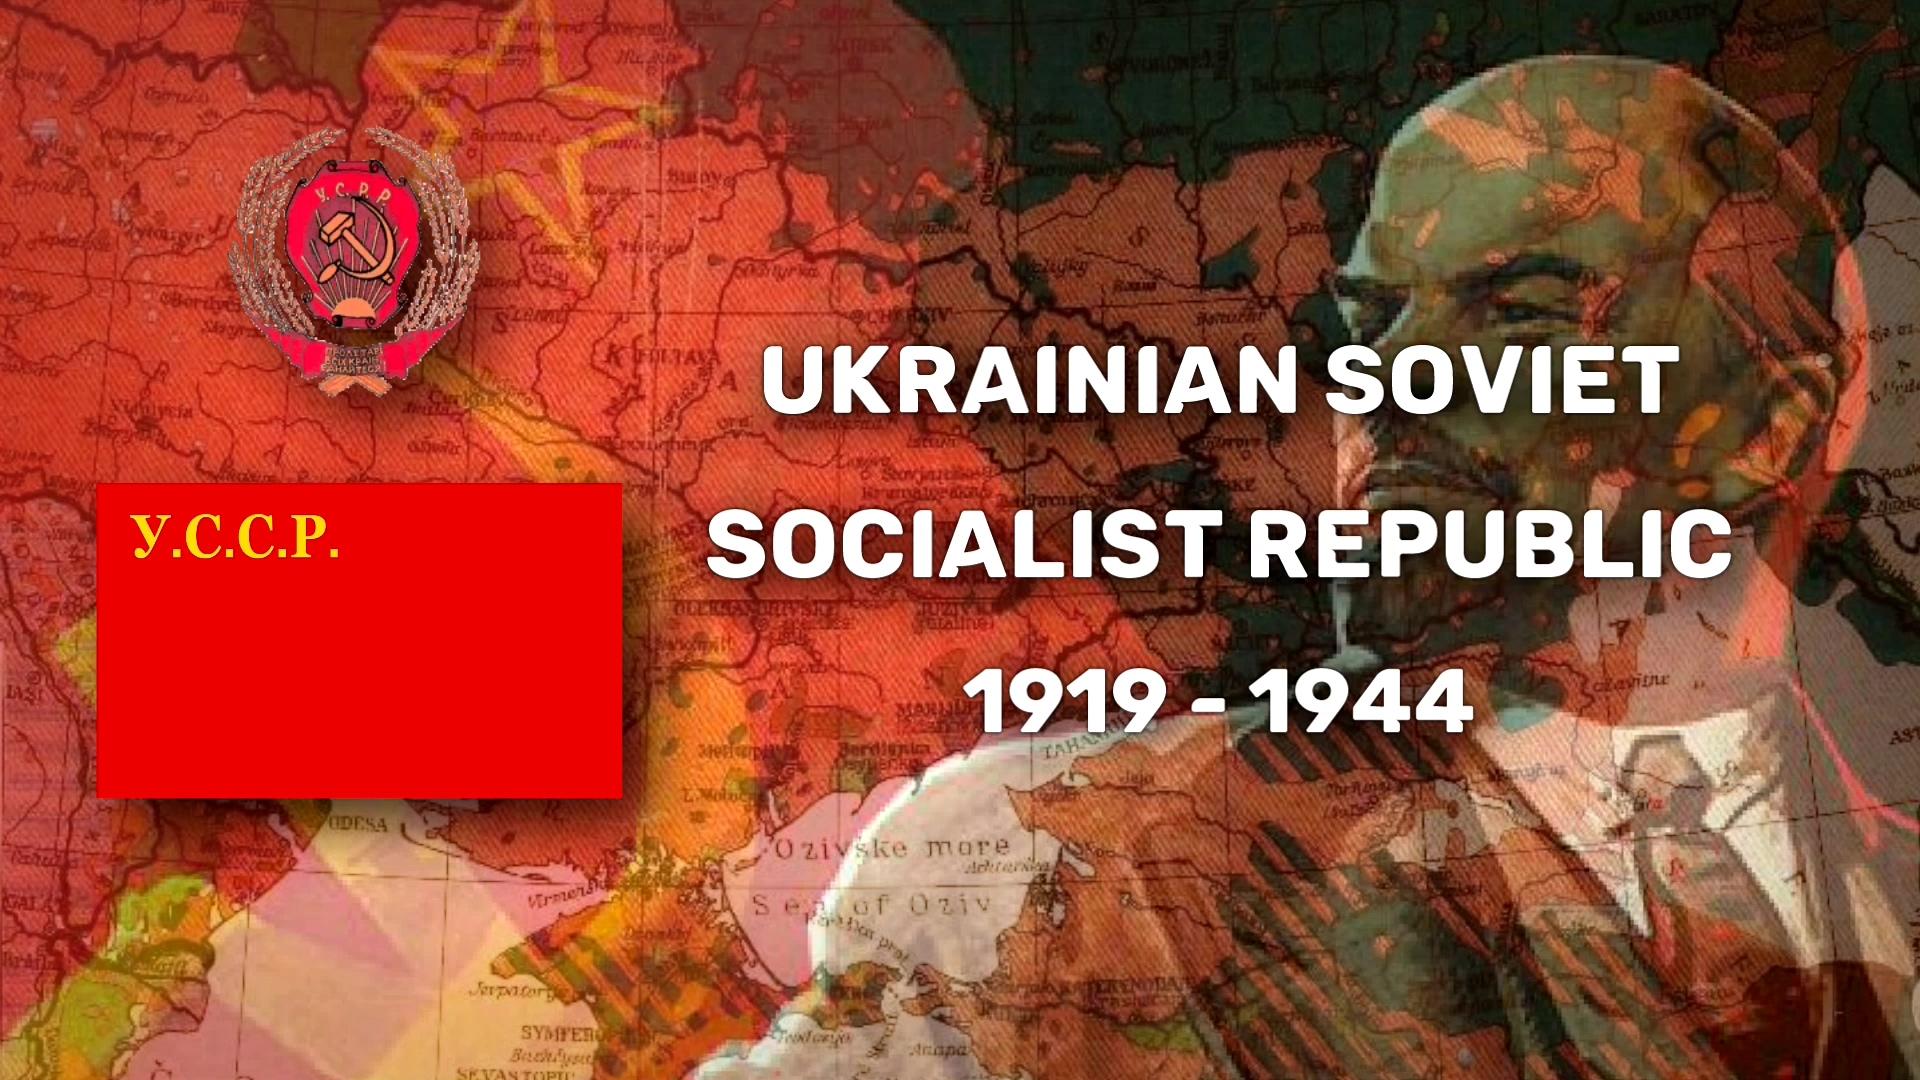 【国歌の历史】乌克兰